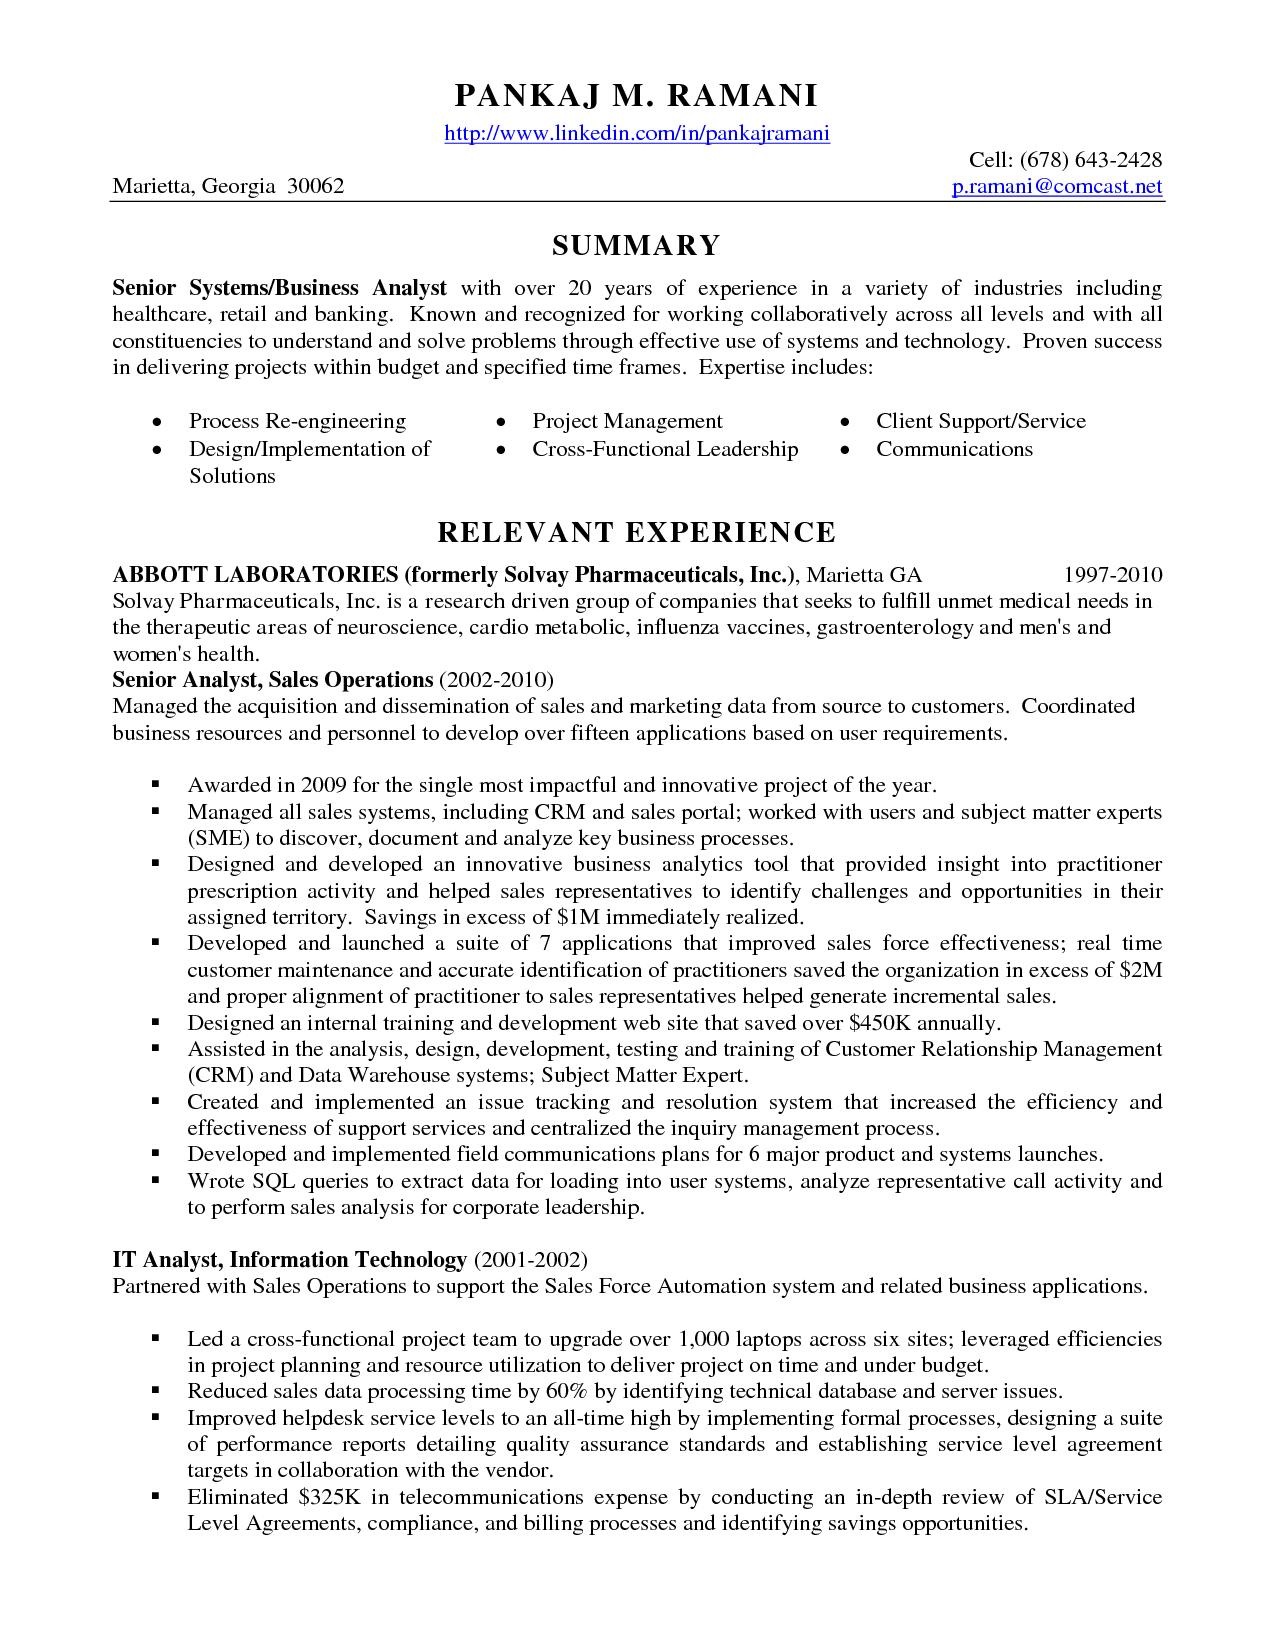 Senior Data Analyst Cv Resume Format Best Templates Work